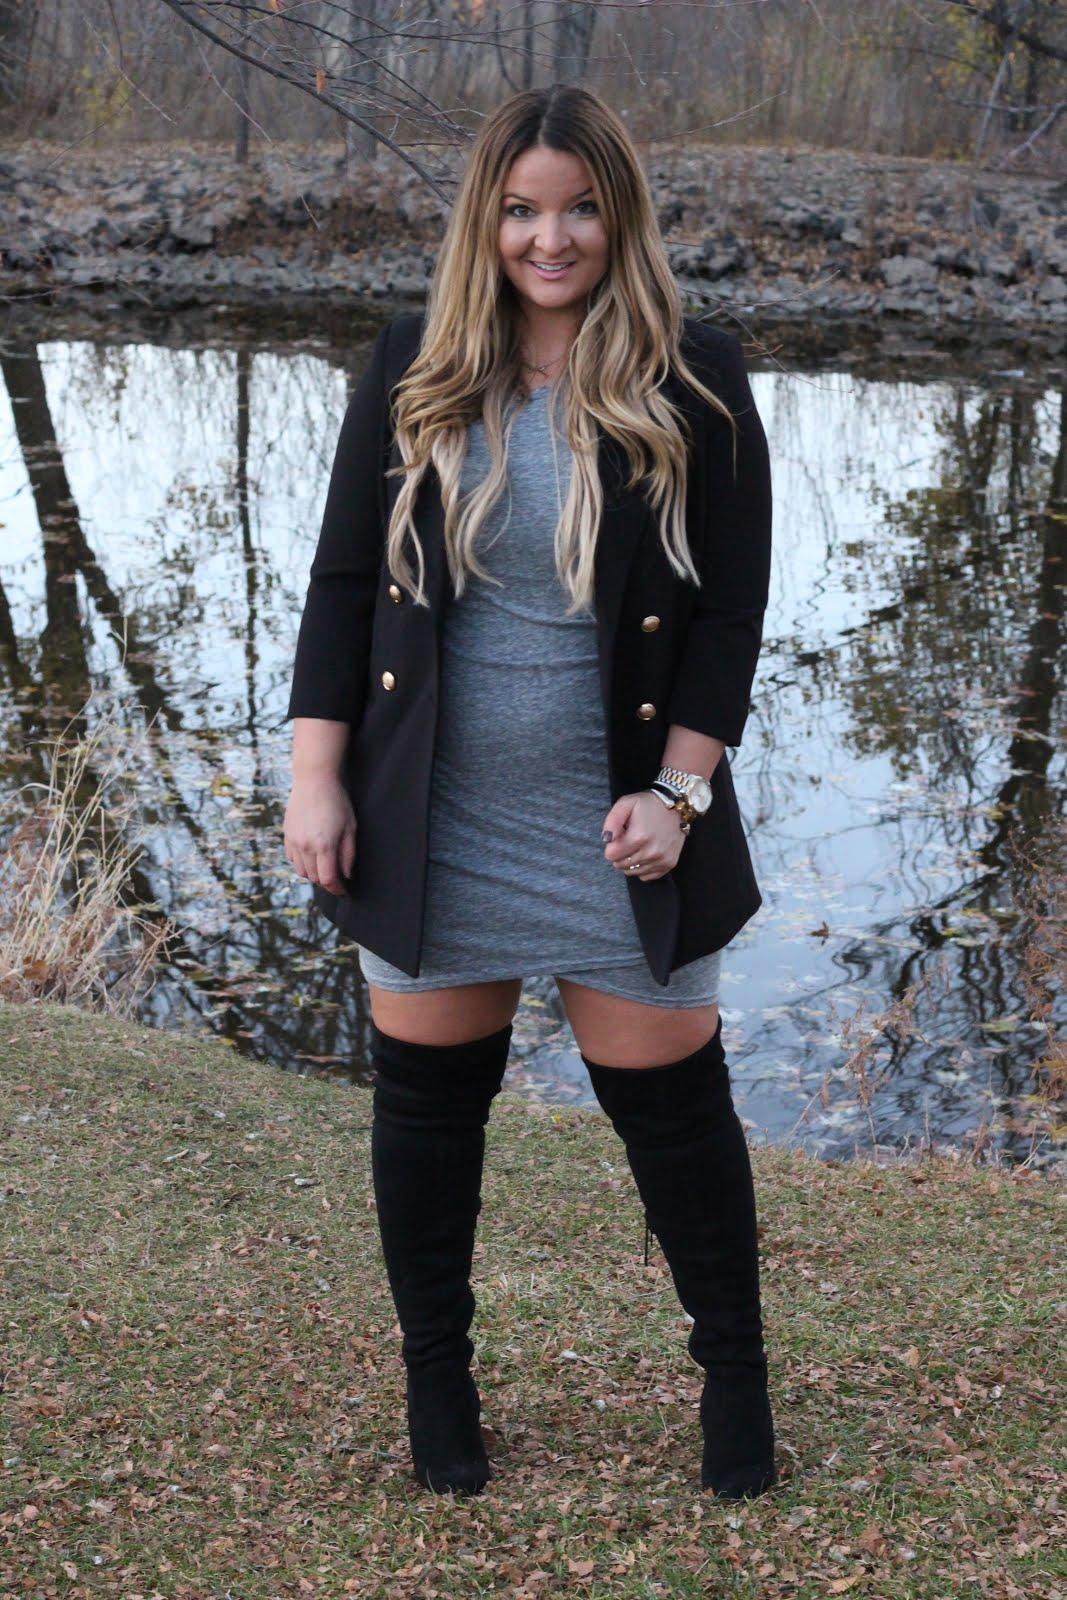 Blazer with Black Thigh High Boots by Denver fashion blogger Delayna Denaye